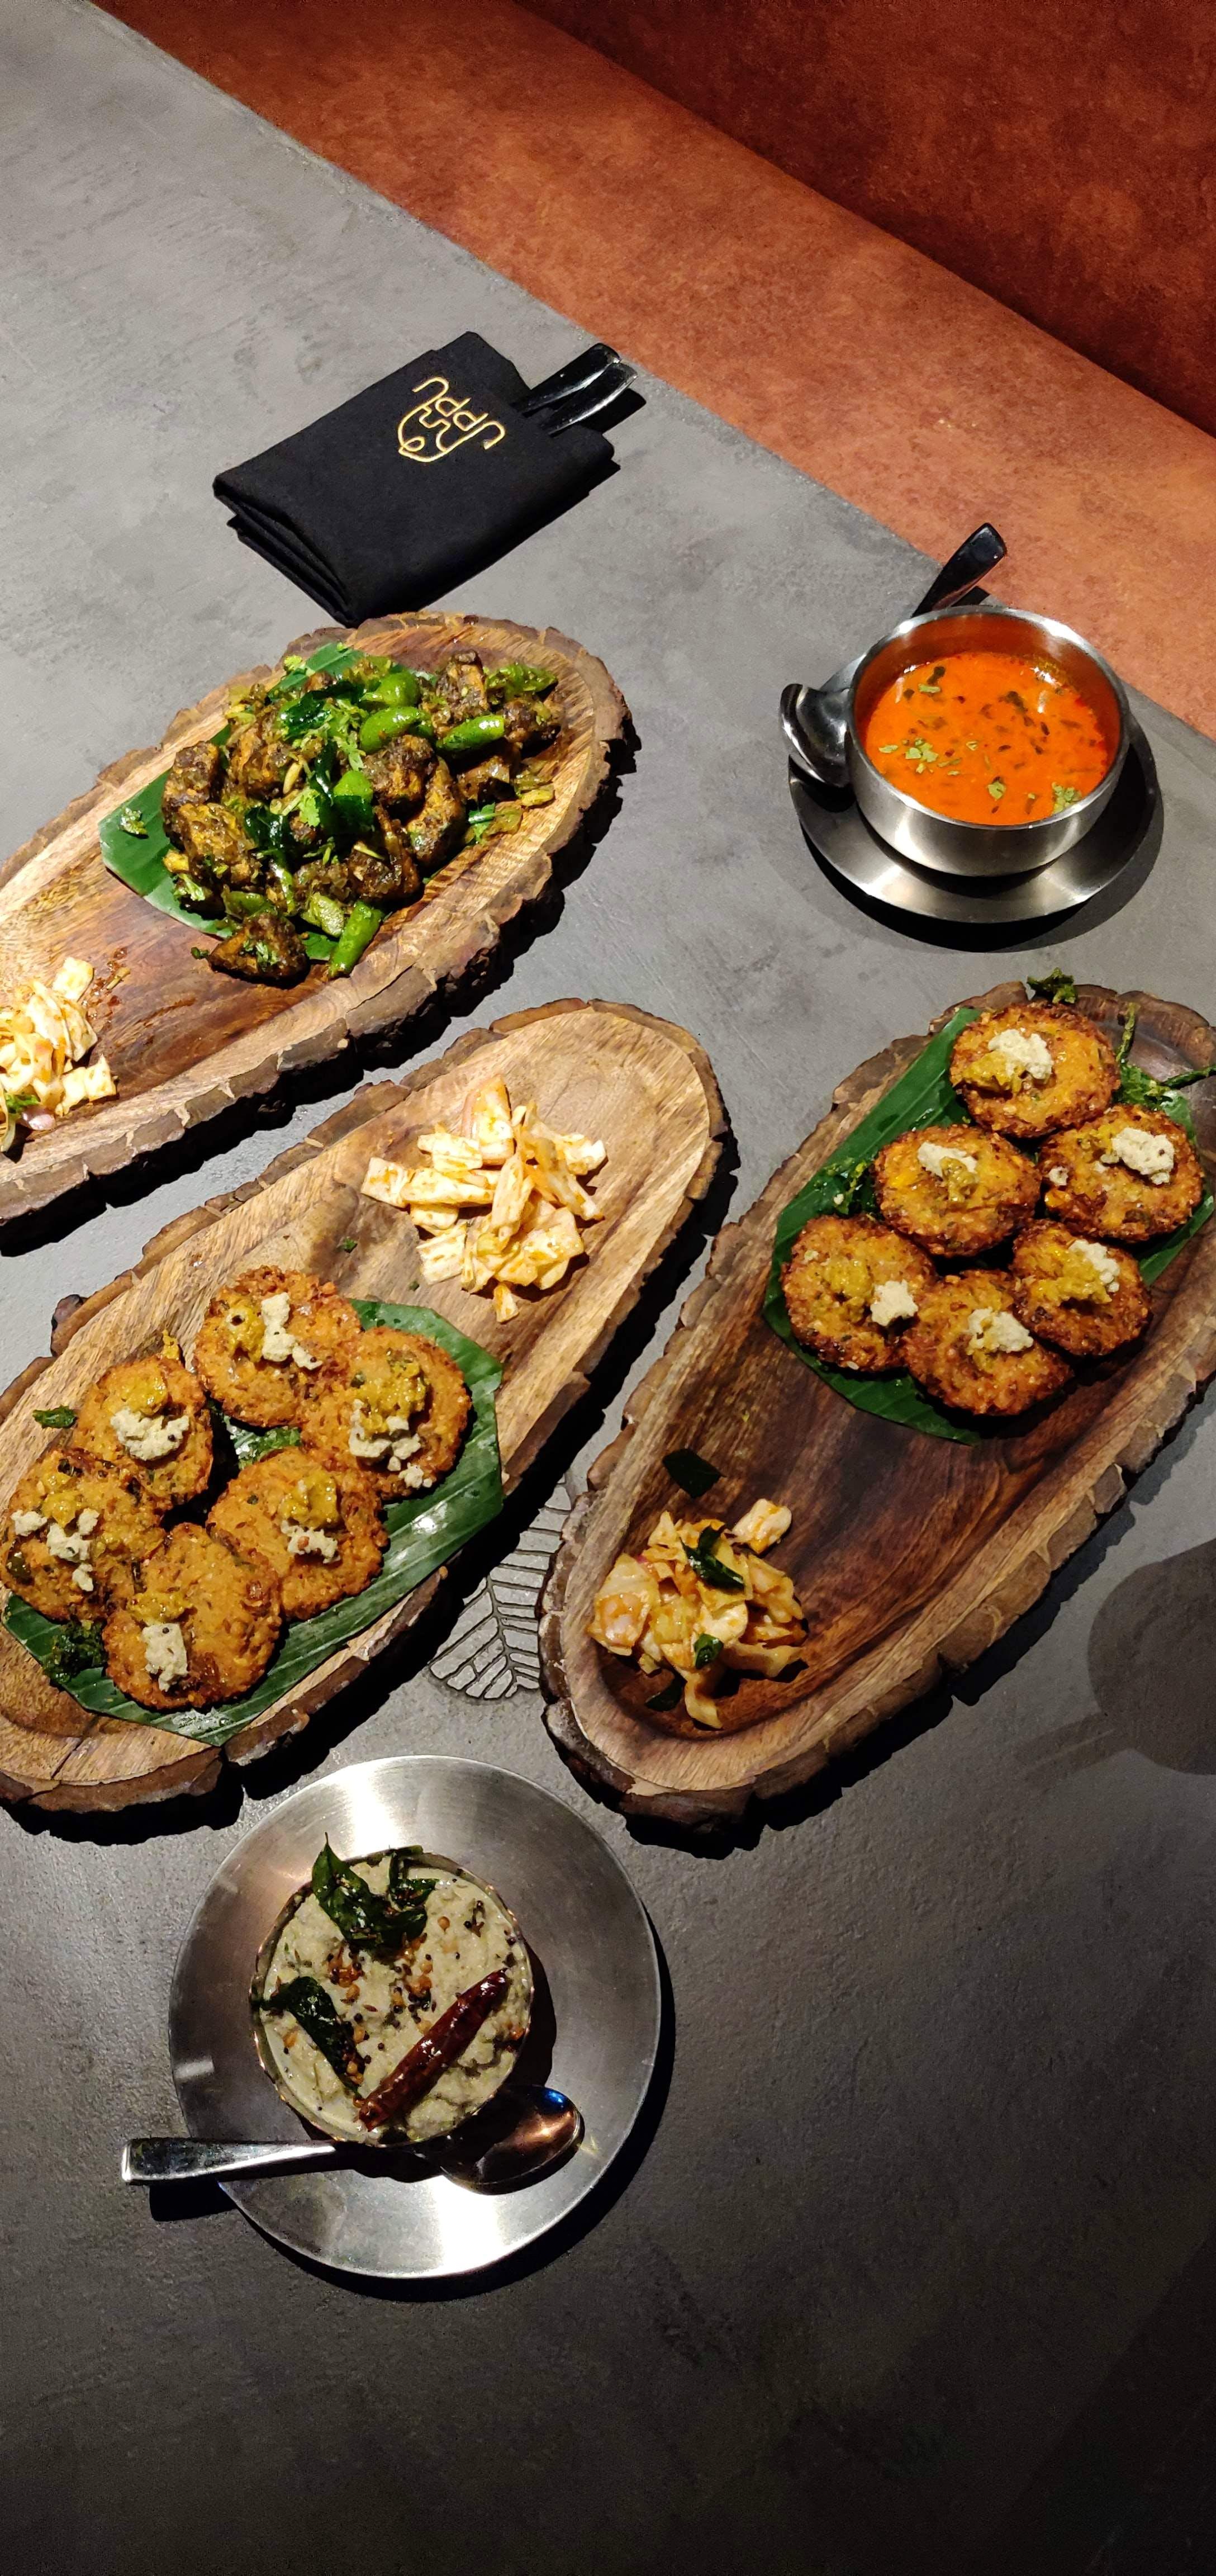 Dish,Food,Cuisine,Ingredient,appetizer,Produce,Bruschetta,Finger food,Vegetarian food,Staple food